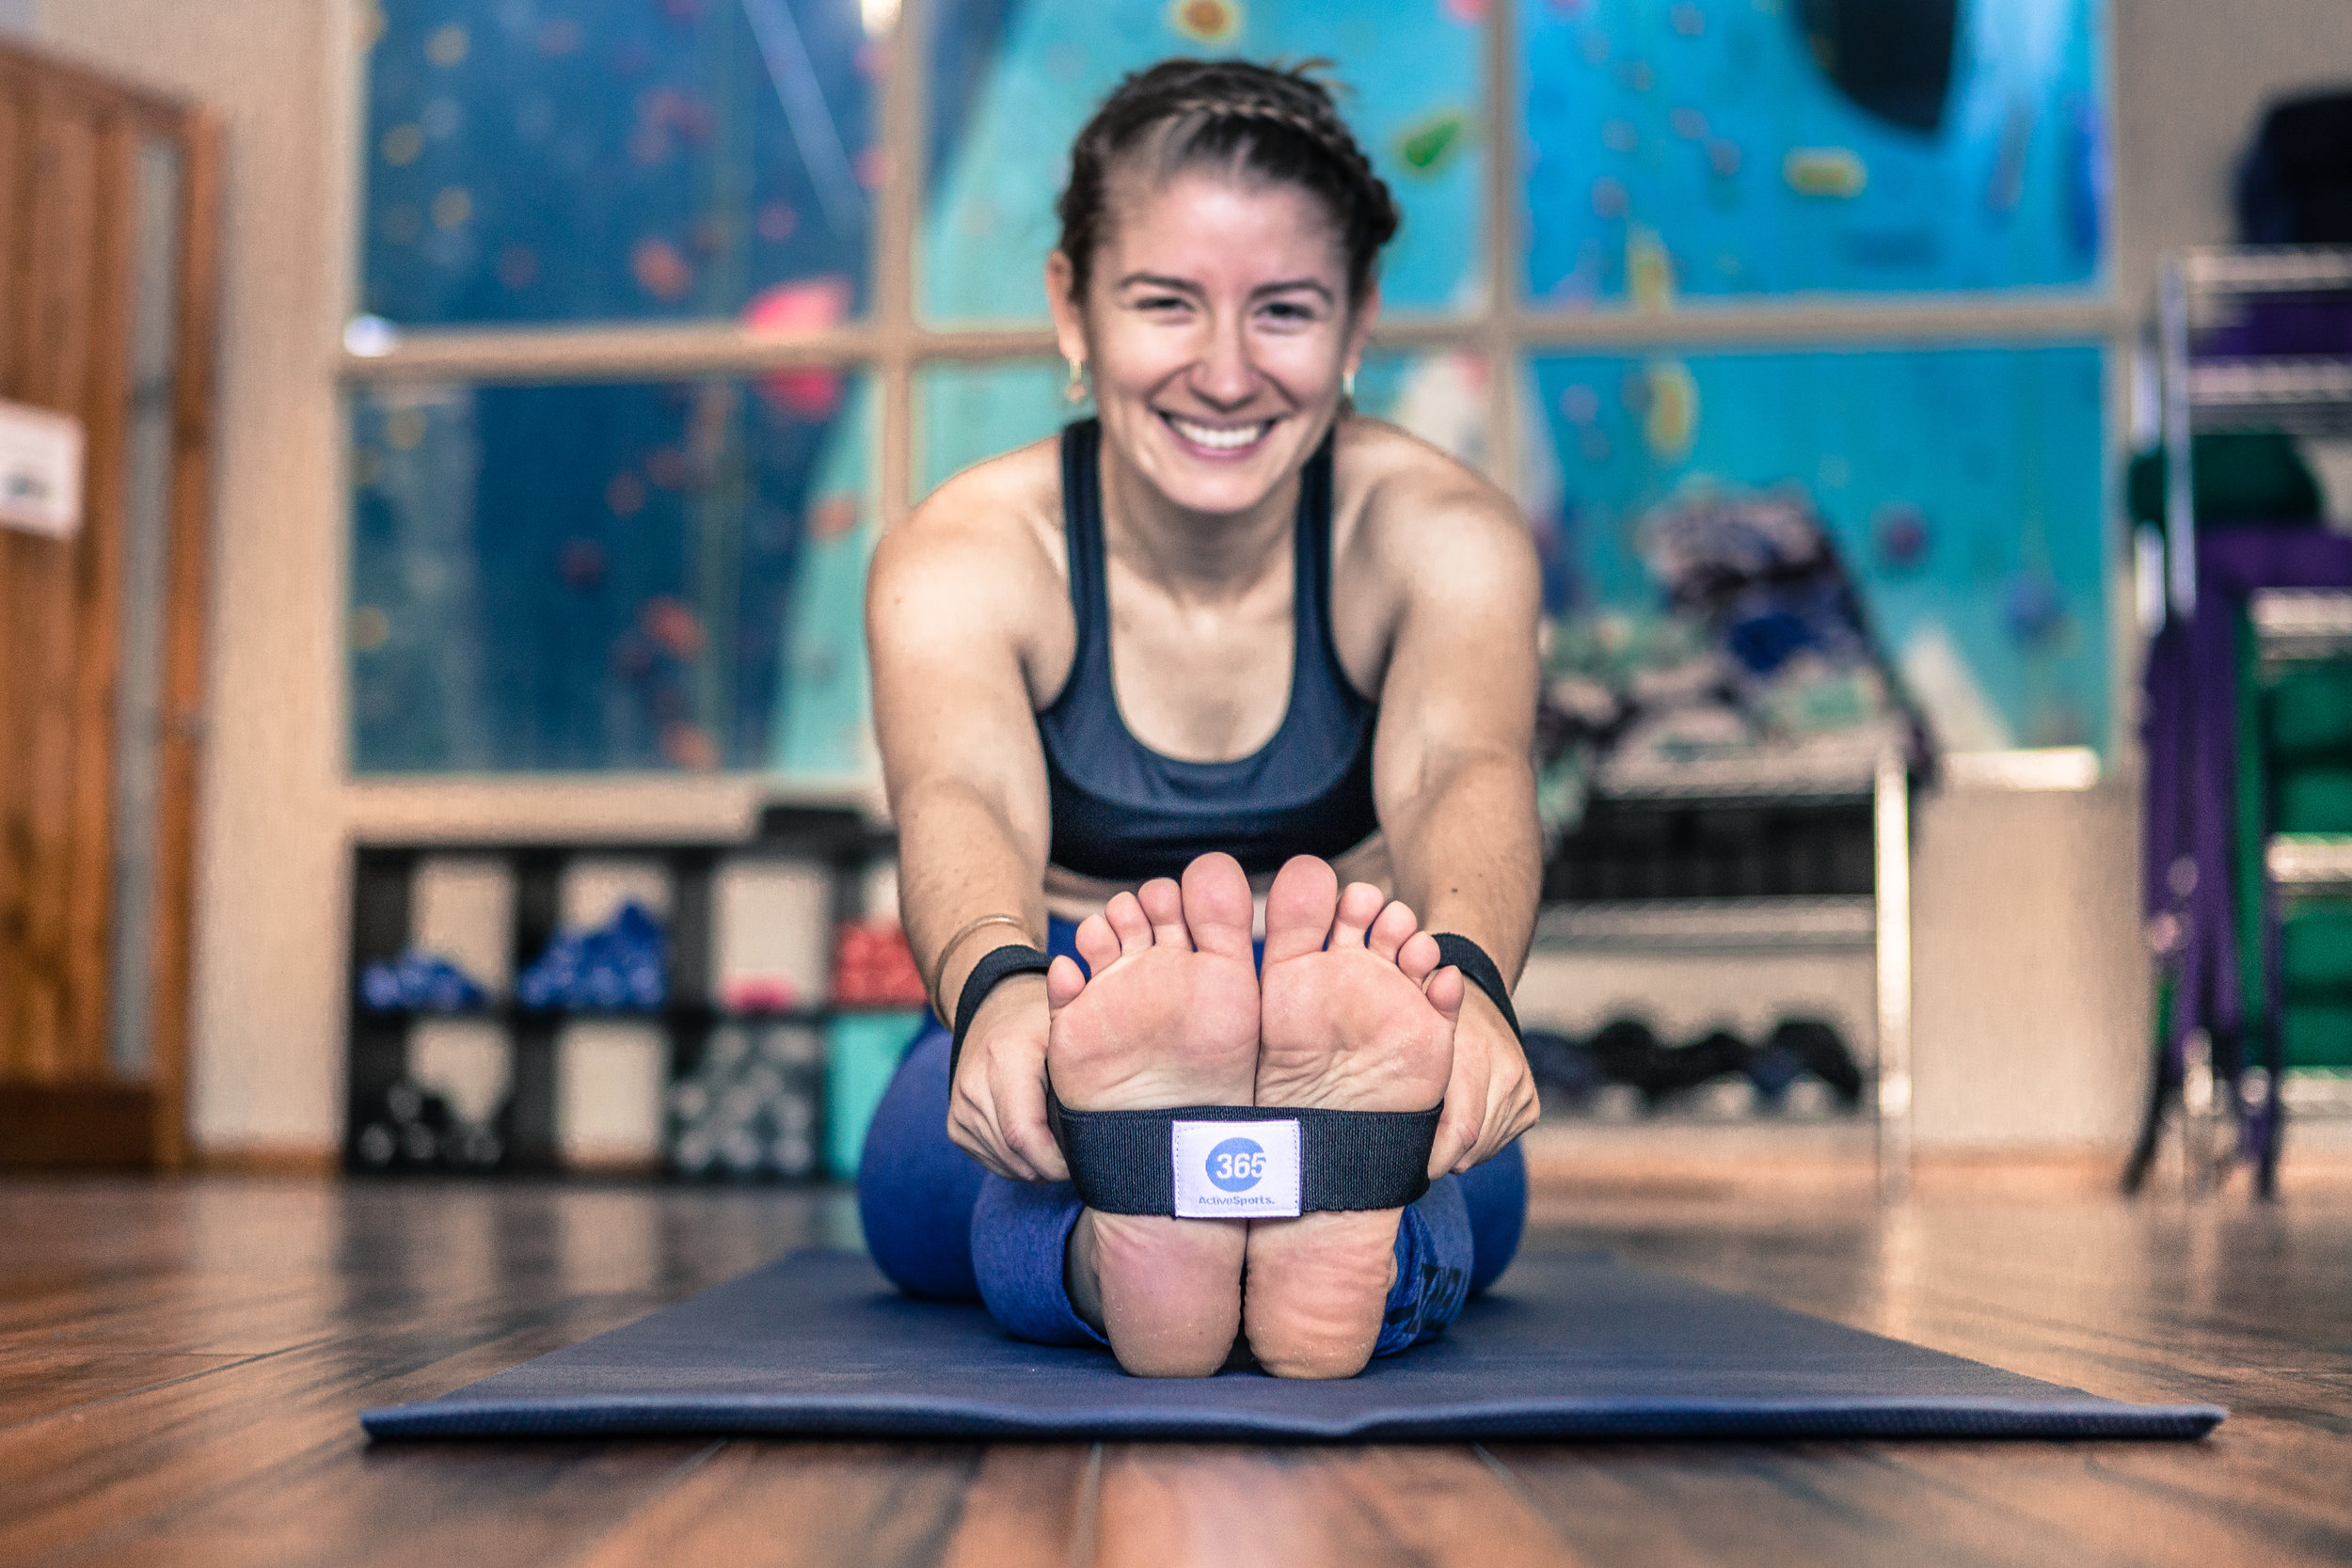 02.03.19 Kristina Yoga Ascent Studio-43.jpg